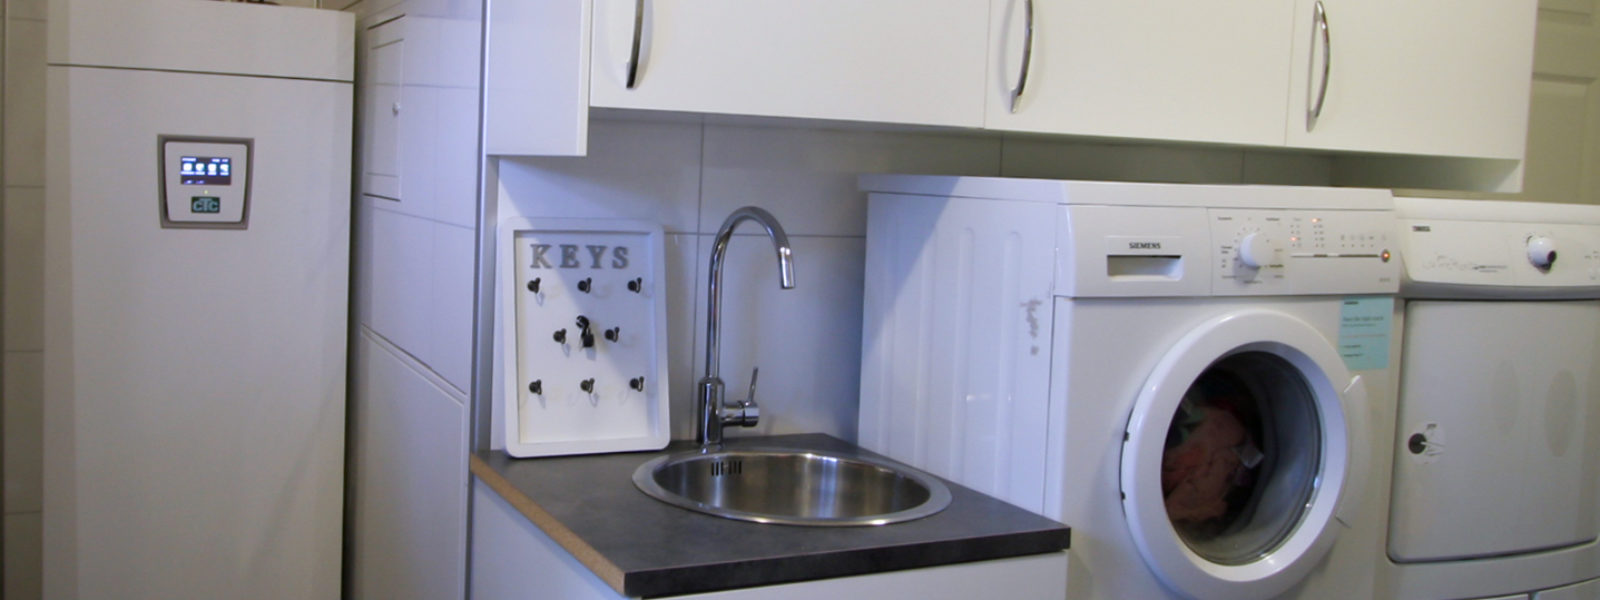 Fleksibel vannbåren varme i ny bolig